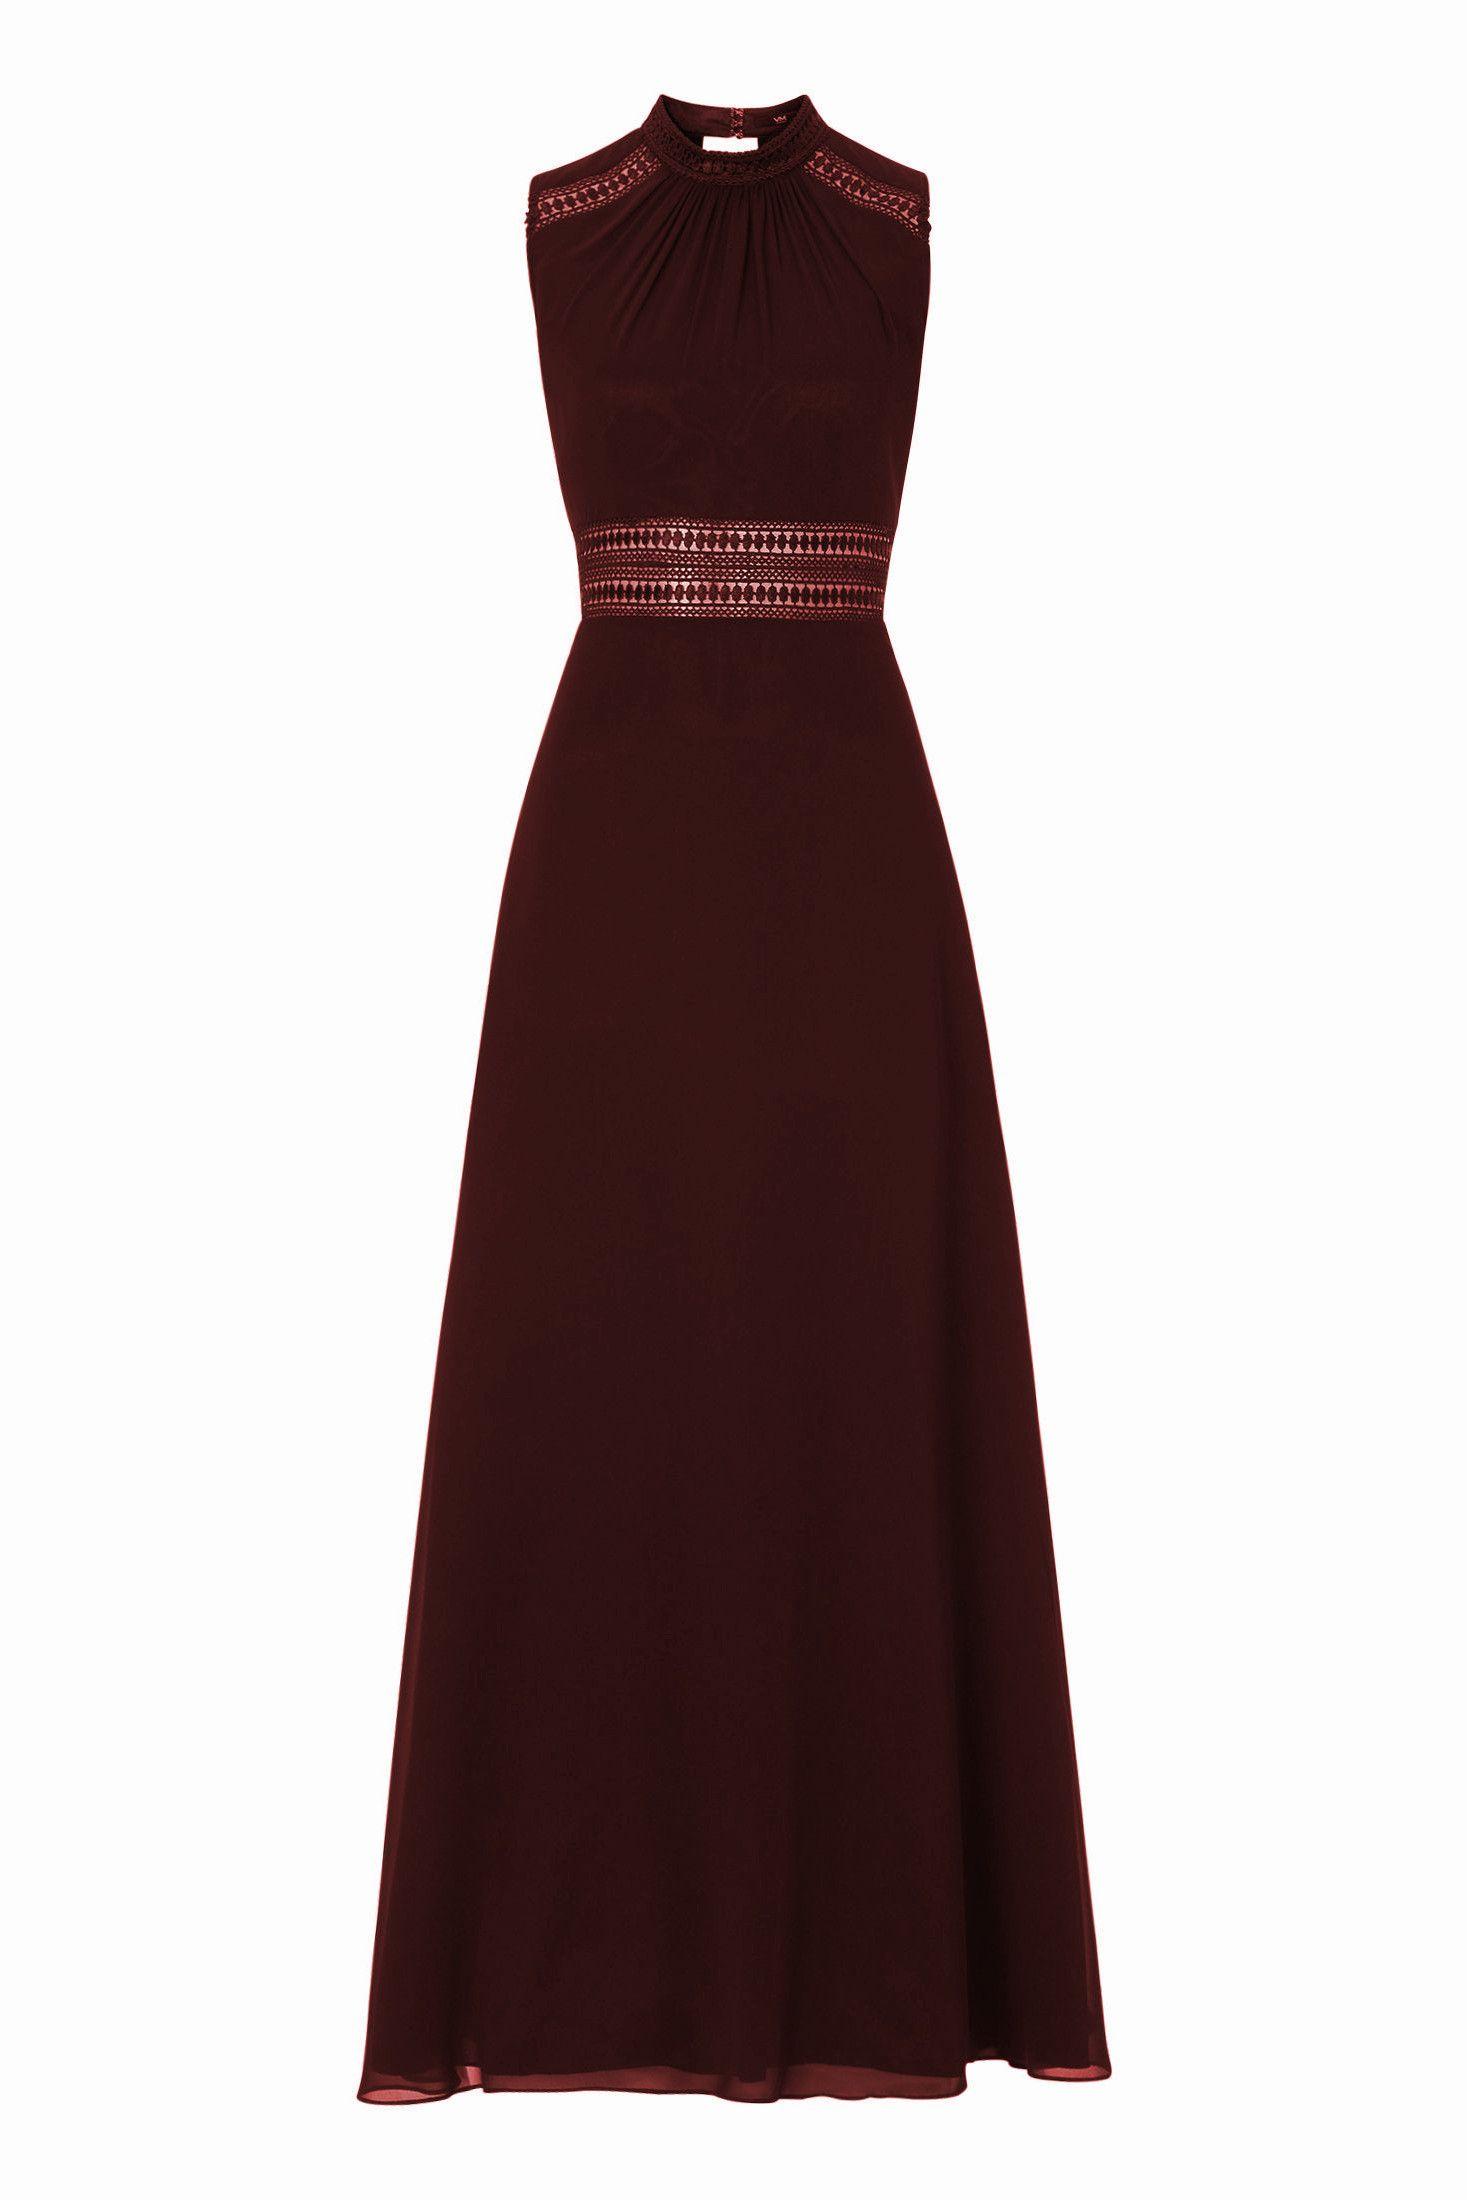 Langes Kleid Chiffon Häkelspitze Rotbraun Vera Mont  Mode